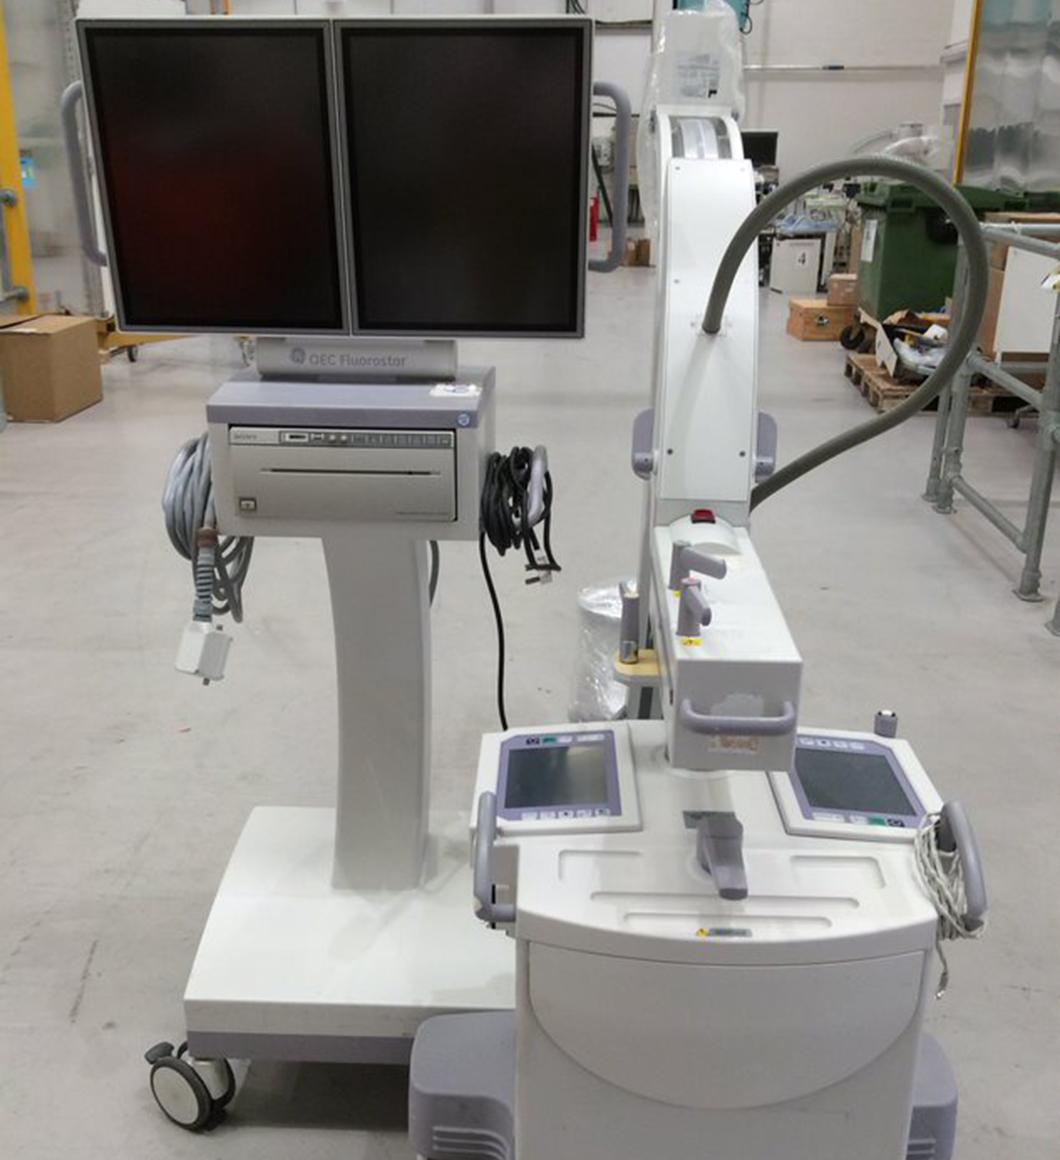 2010 GE OEC Fluorostar 7900 C-Arm - #6D